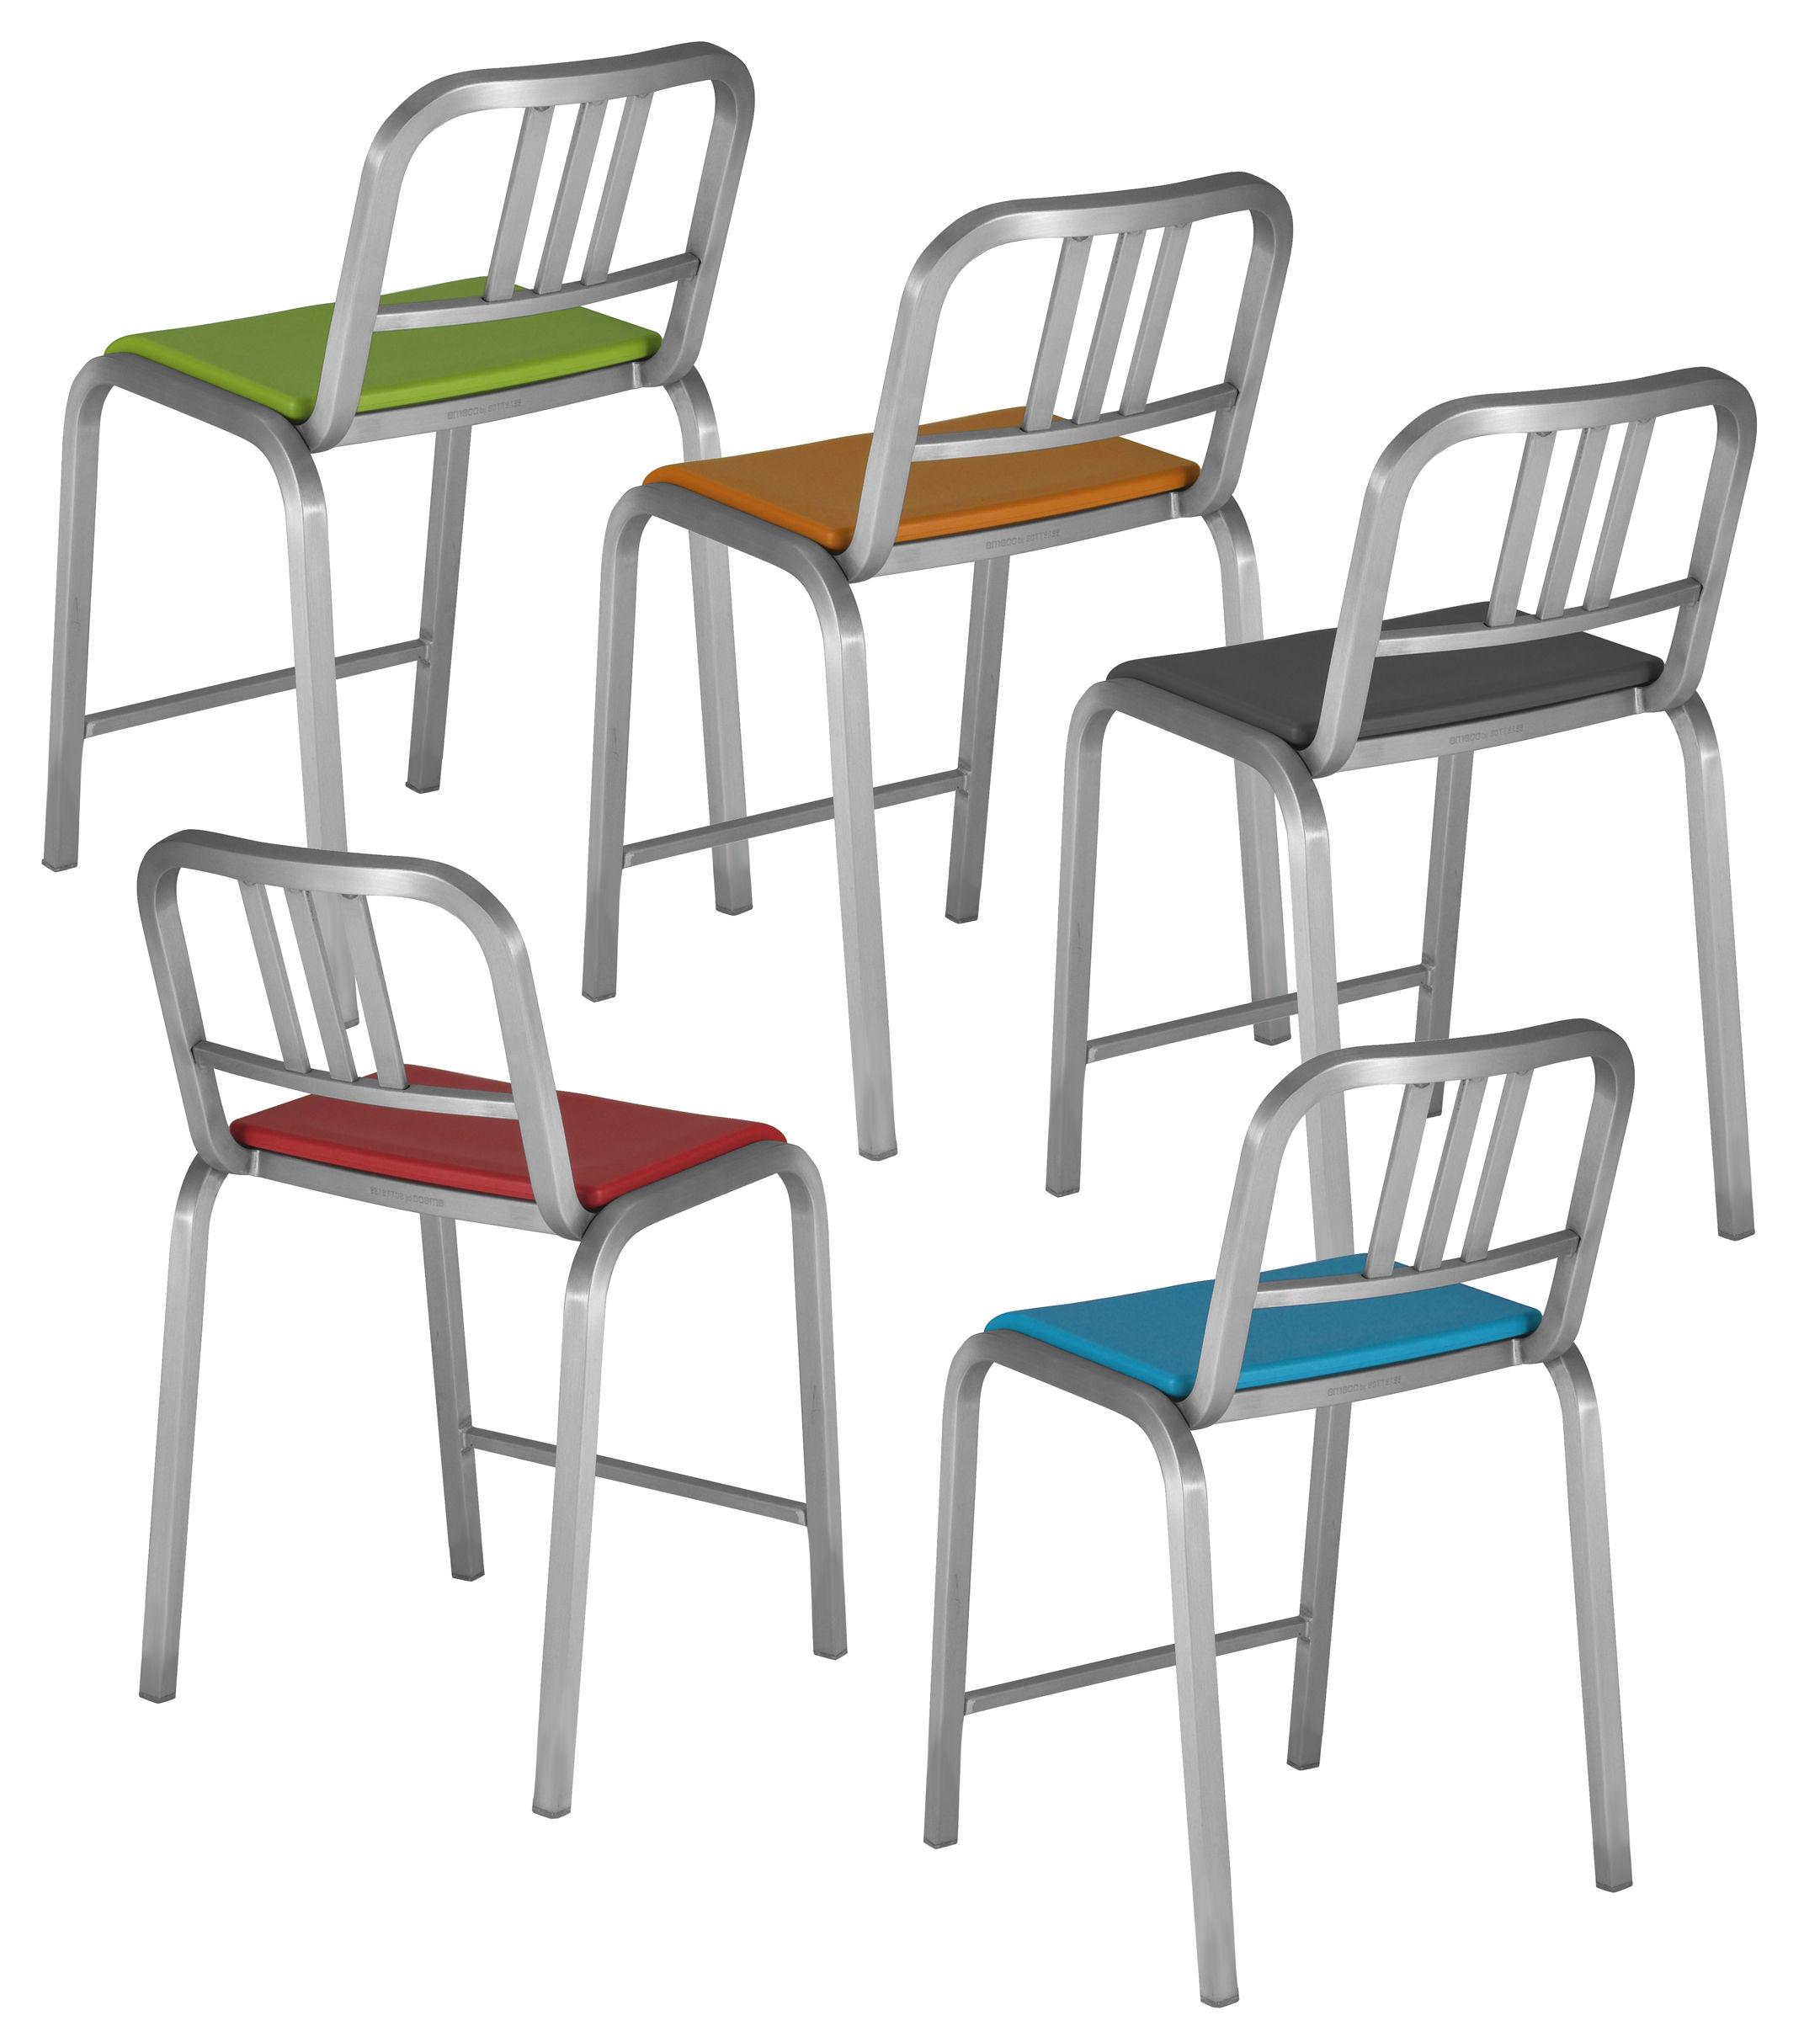 chaise de bar nine o assise rembourr e h 60 cm aluminium mat orange emeco. Black Bedroom Furniture Sets. Home Design Ideas